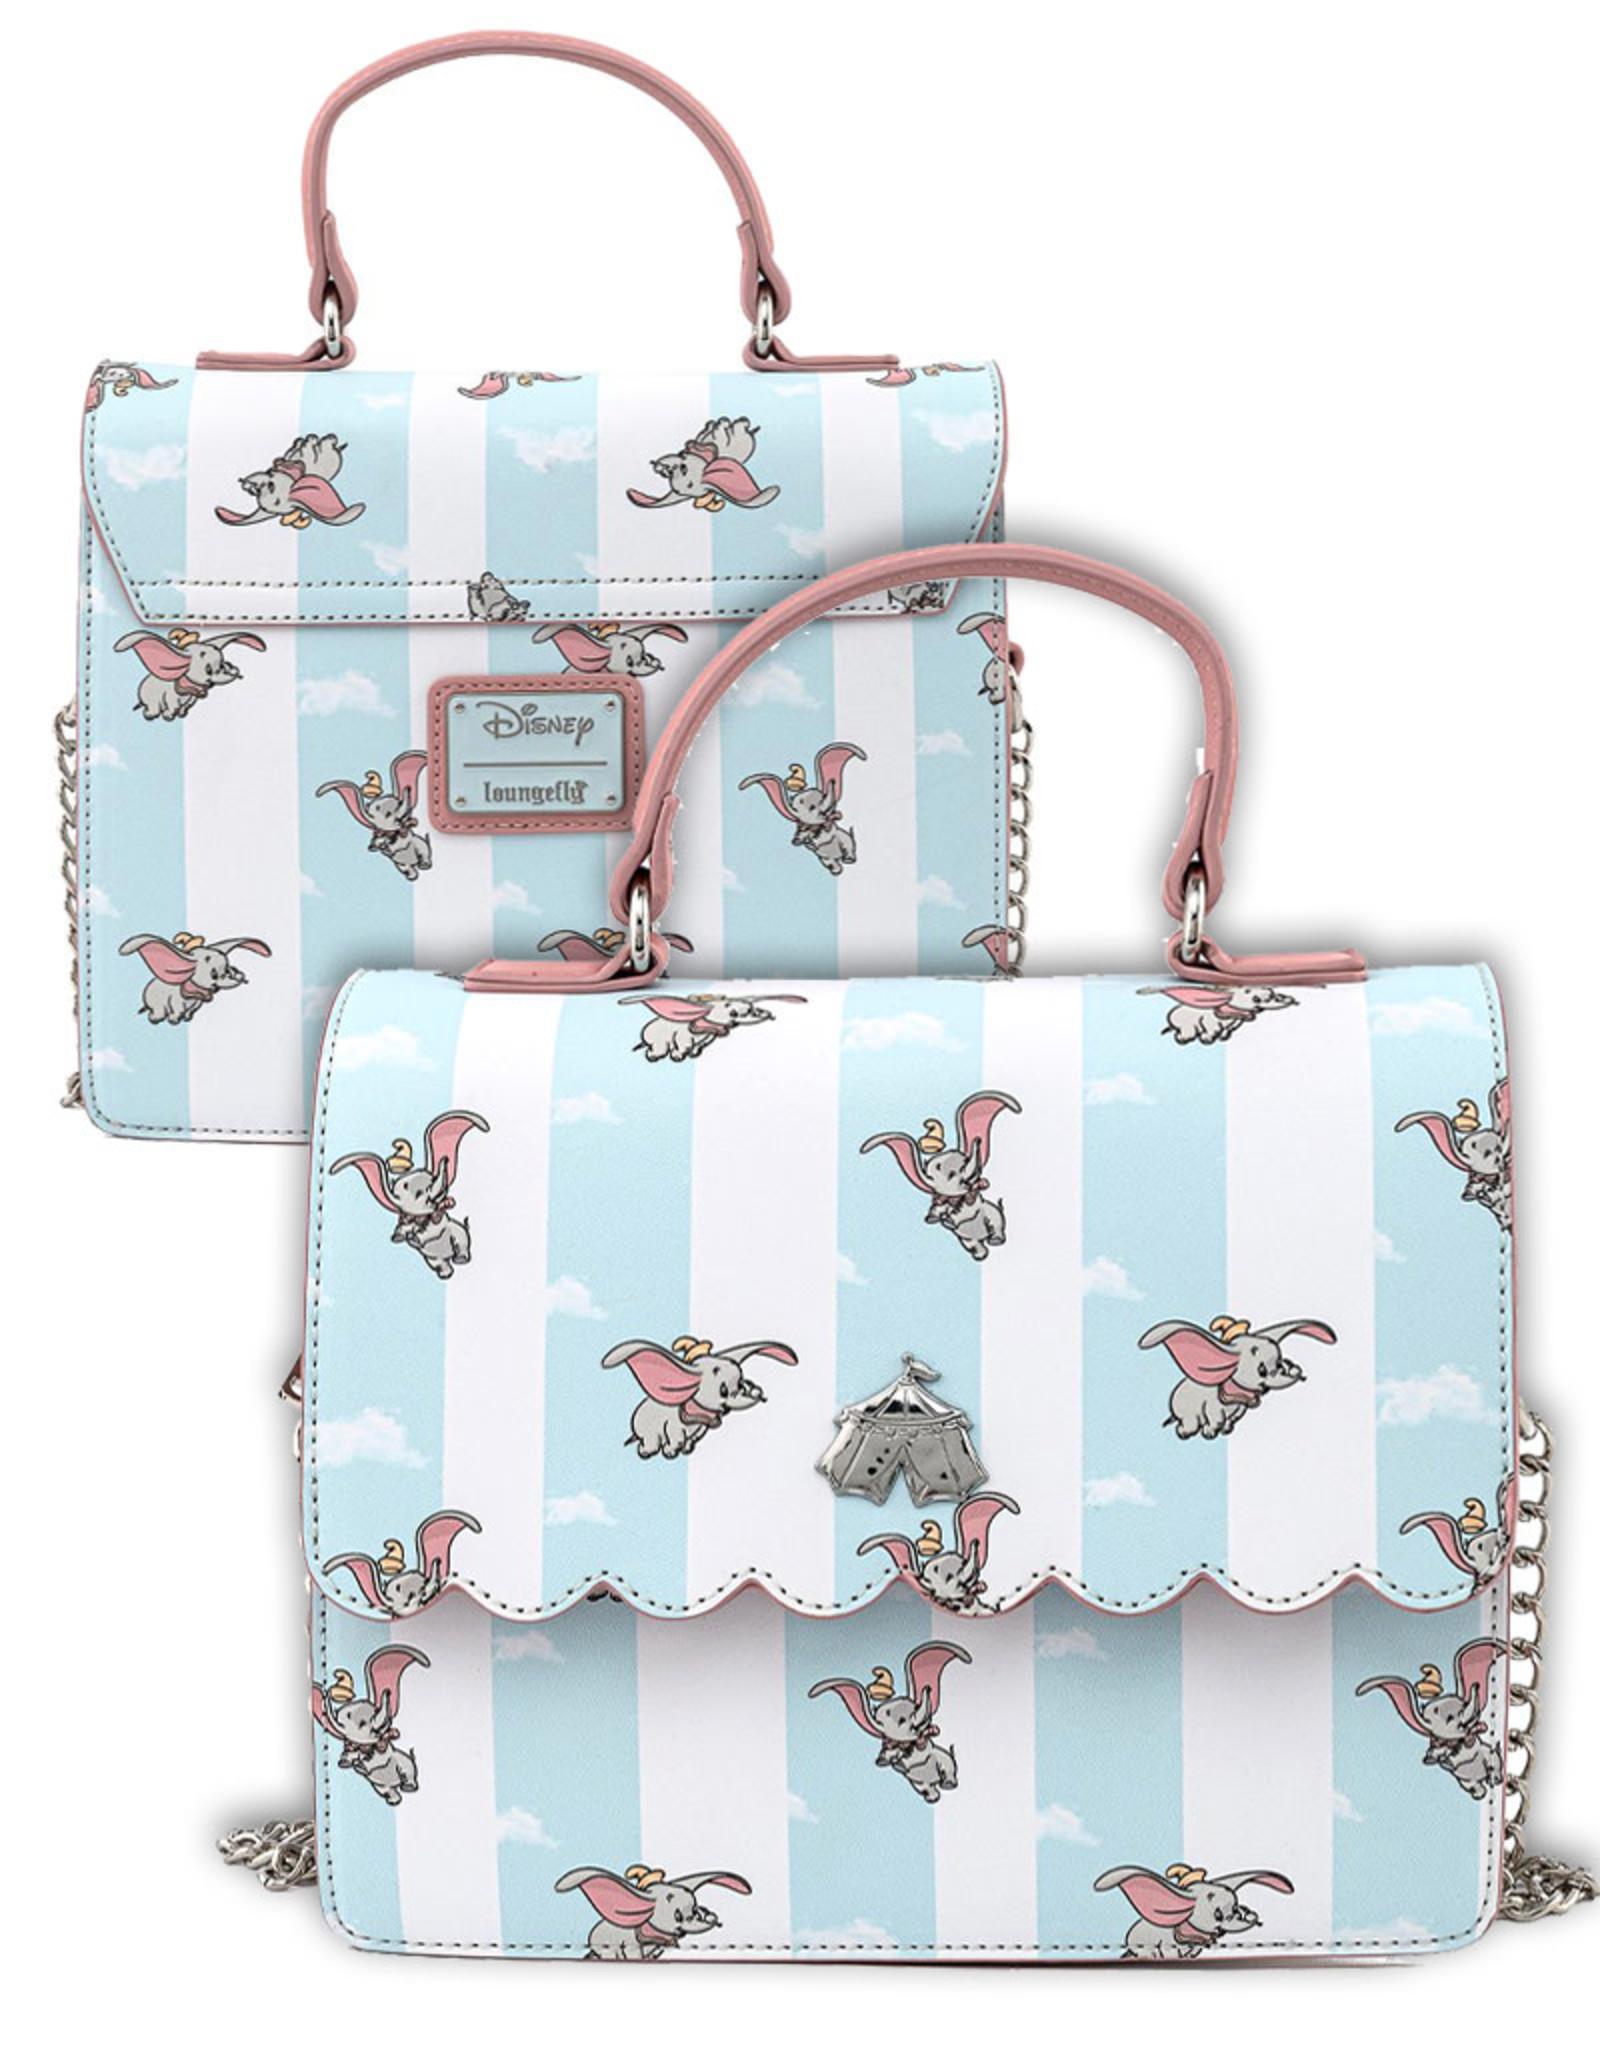 Disney ( Loungefly Handbag) Dumbo